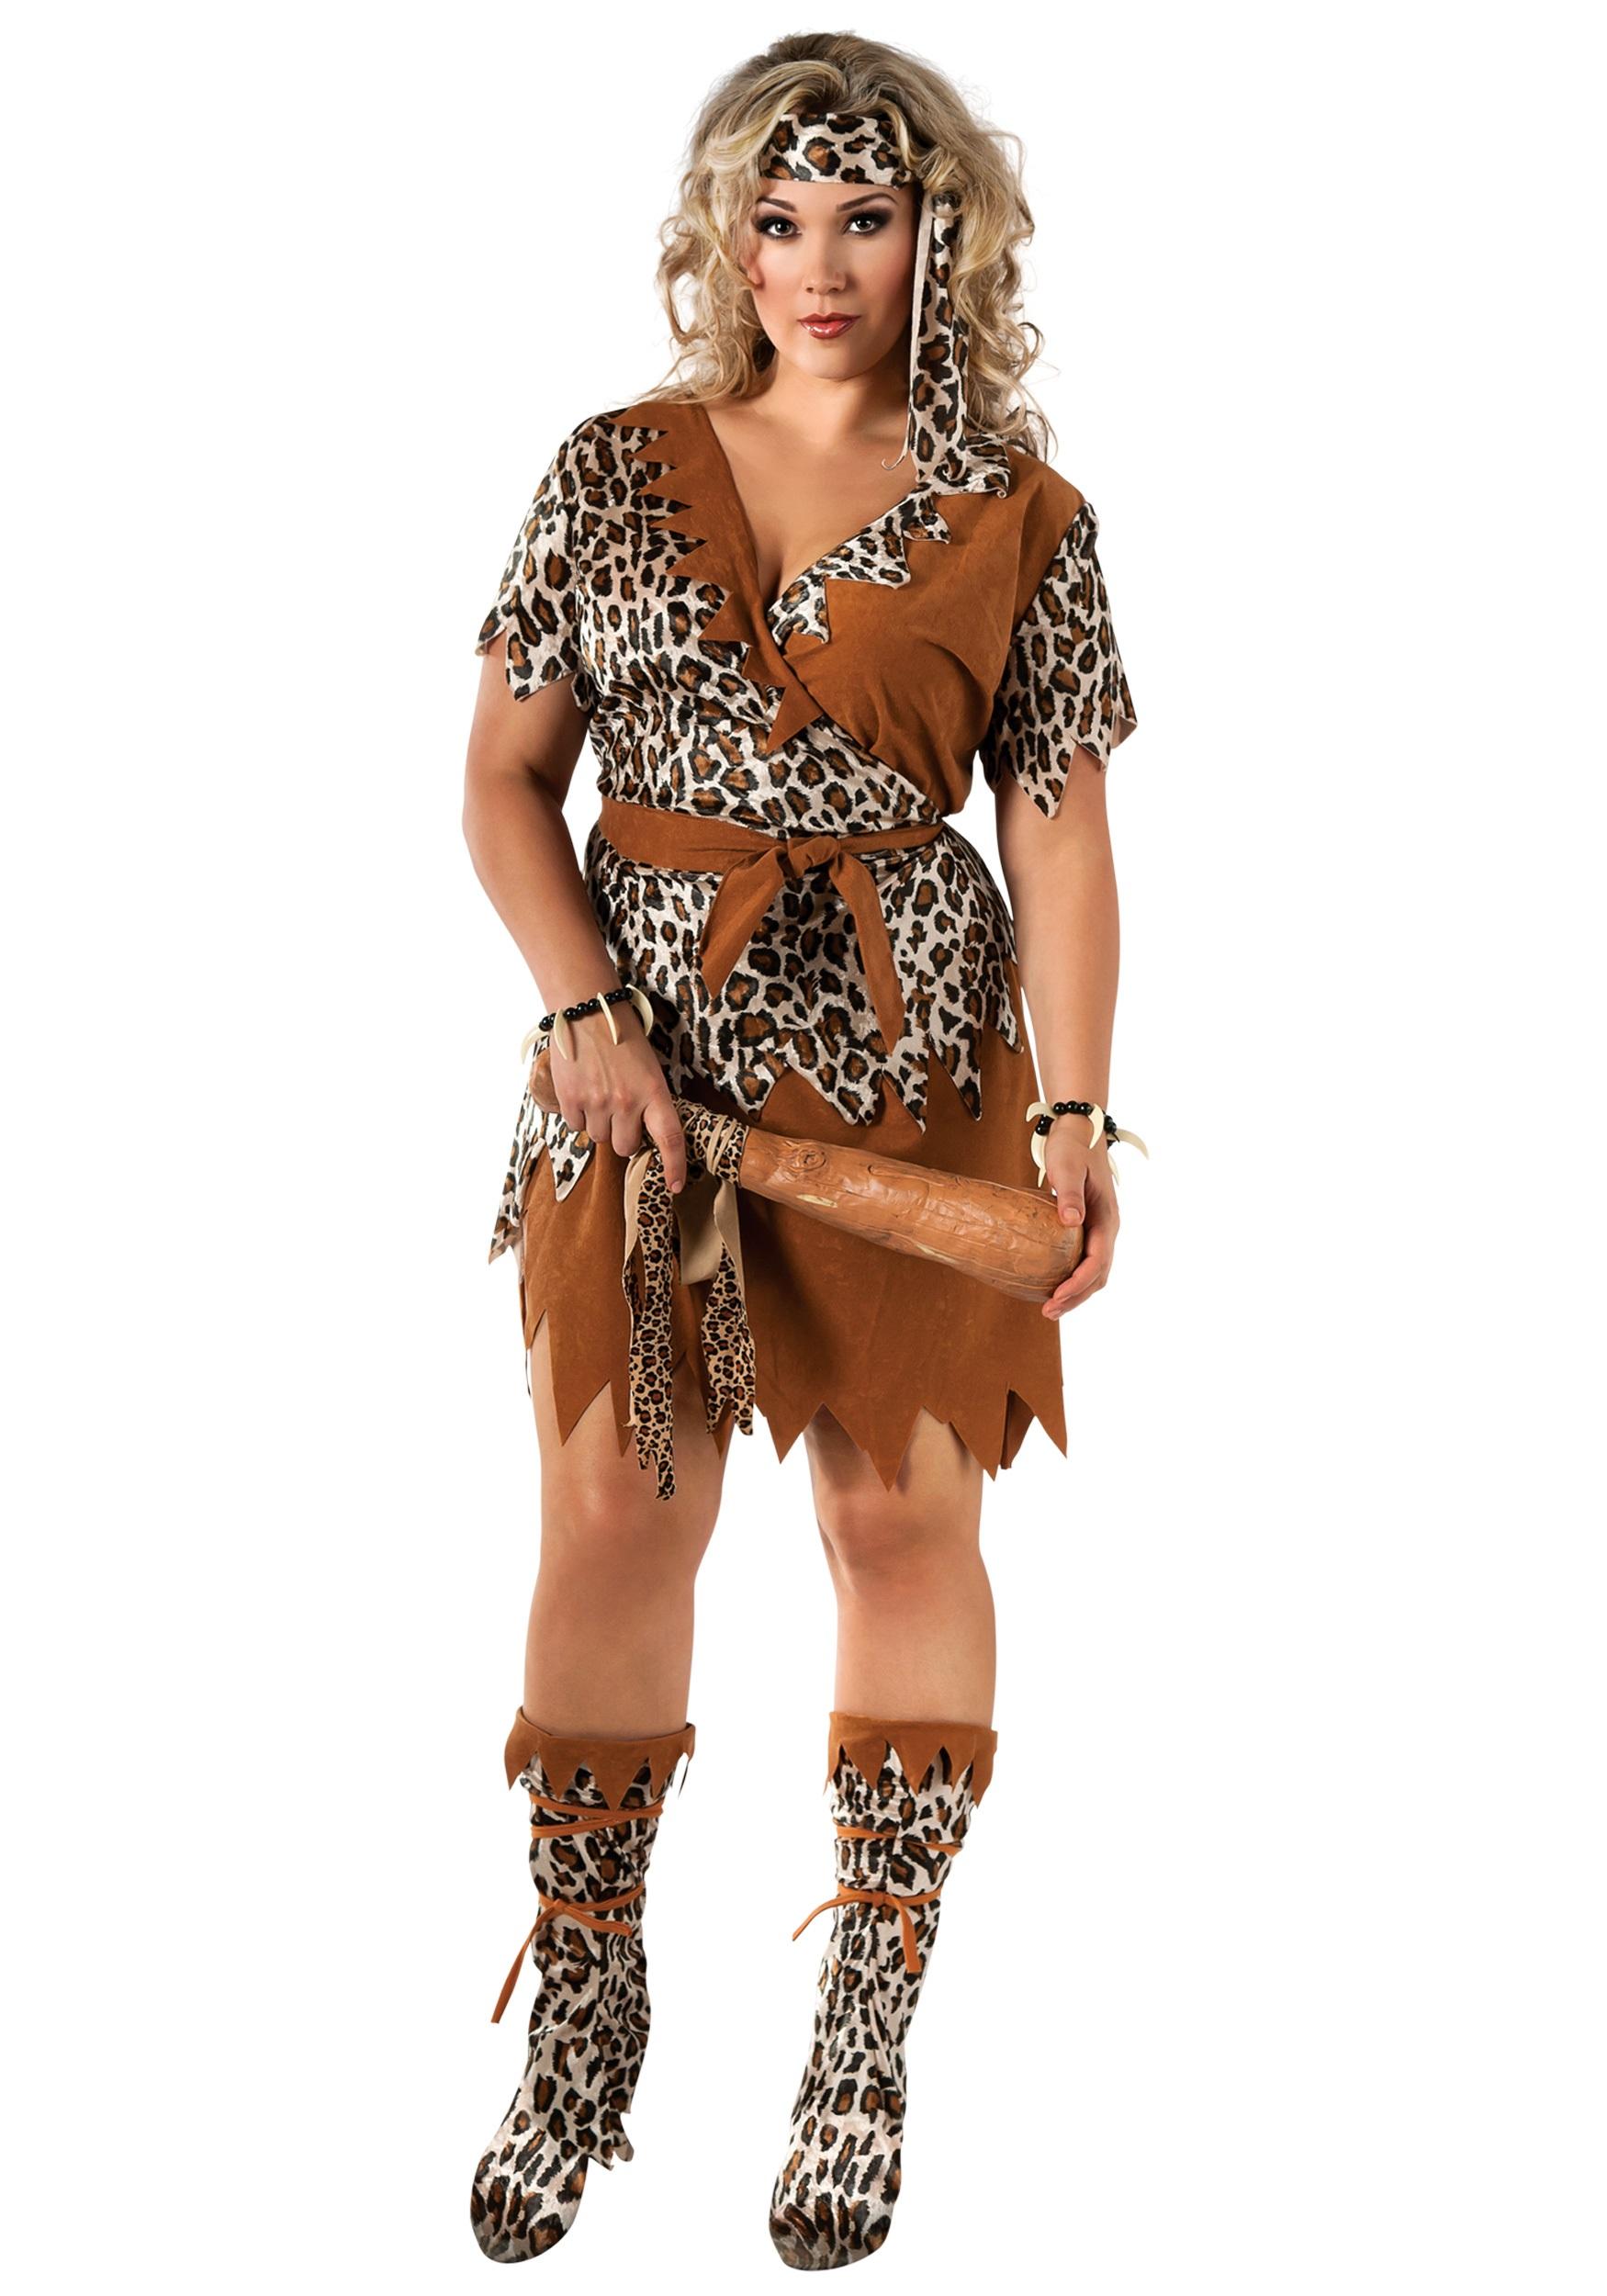 Caveman Dress Up Ideas : Cavewoman plus size costume